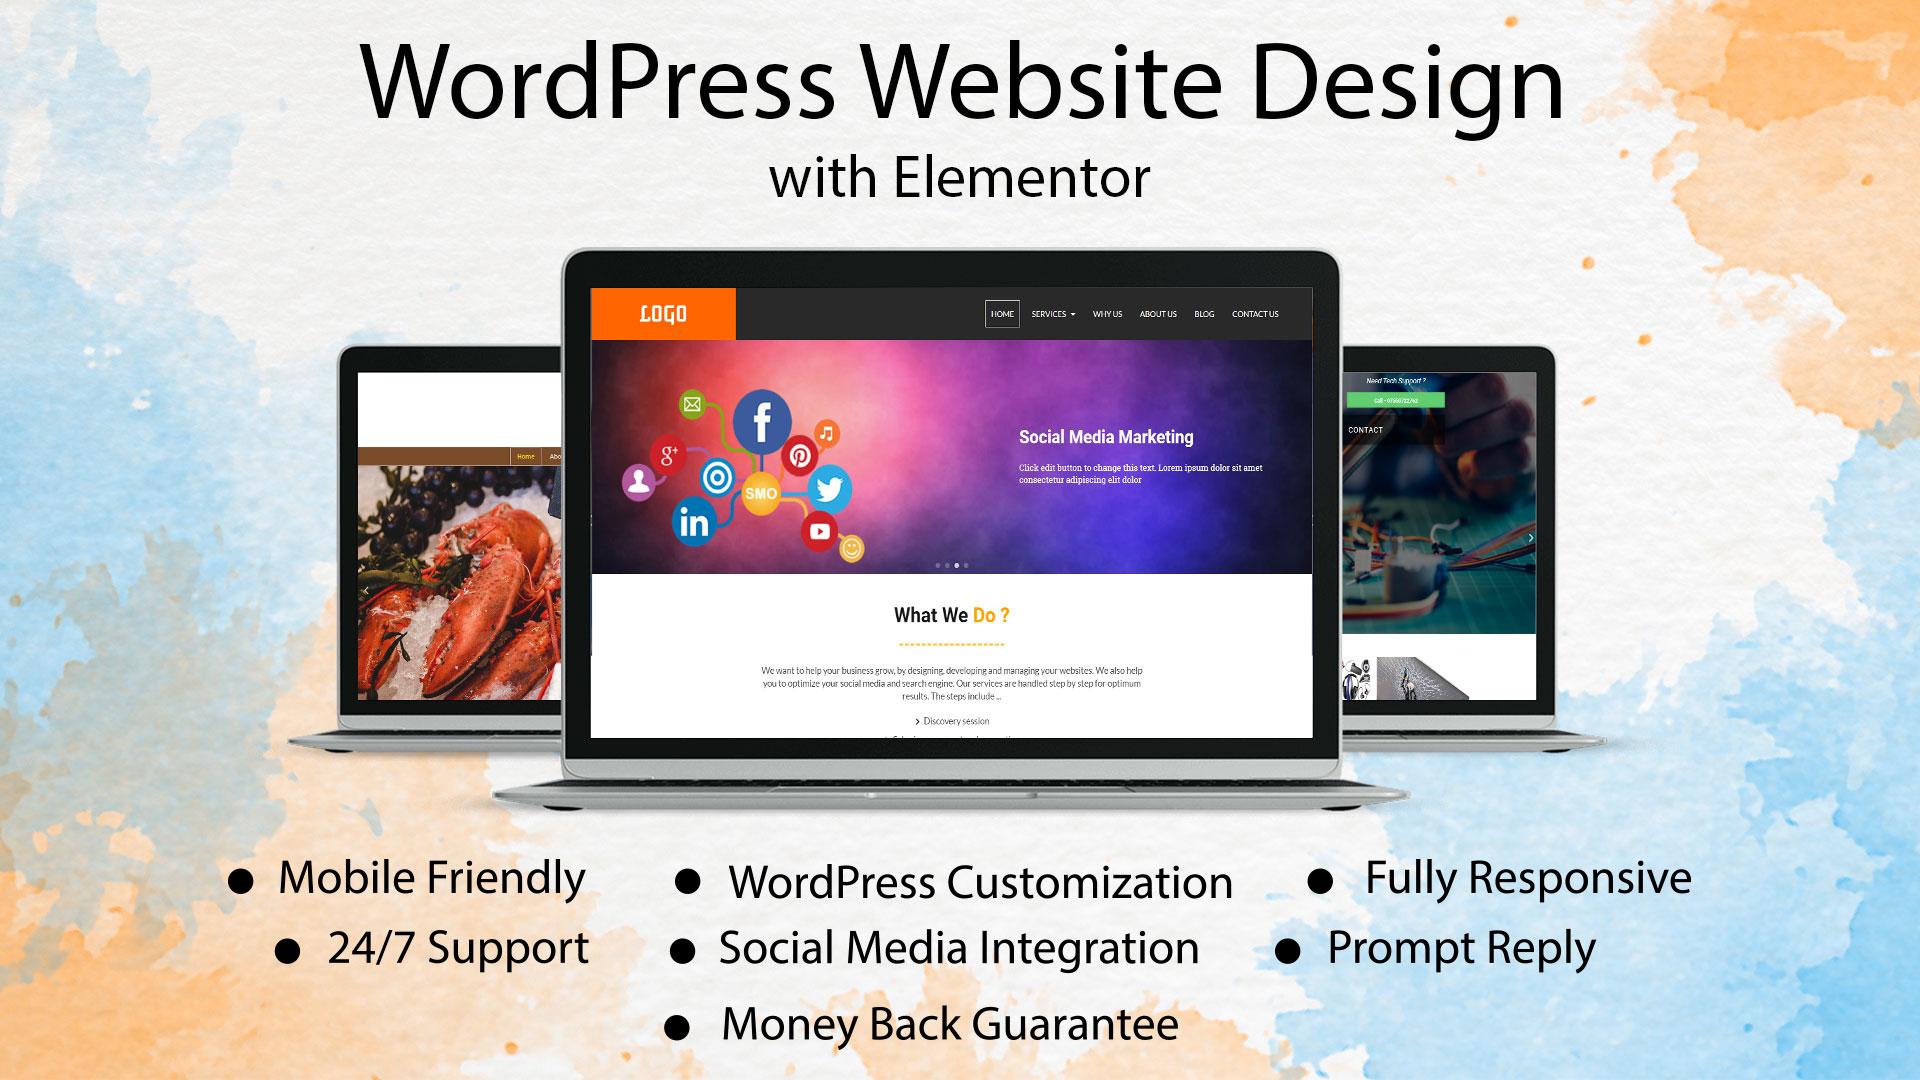 I will design mobile friendly wordpress website